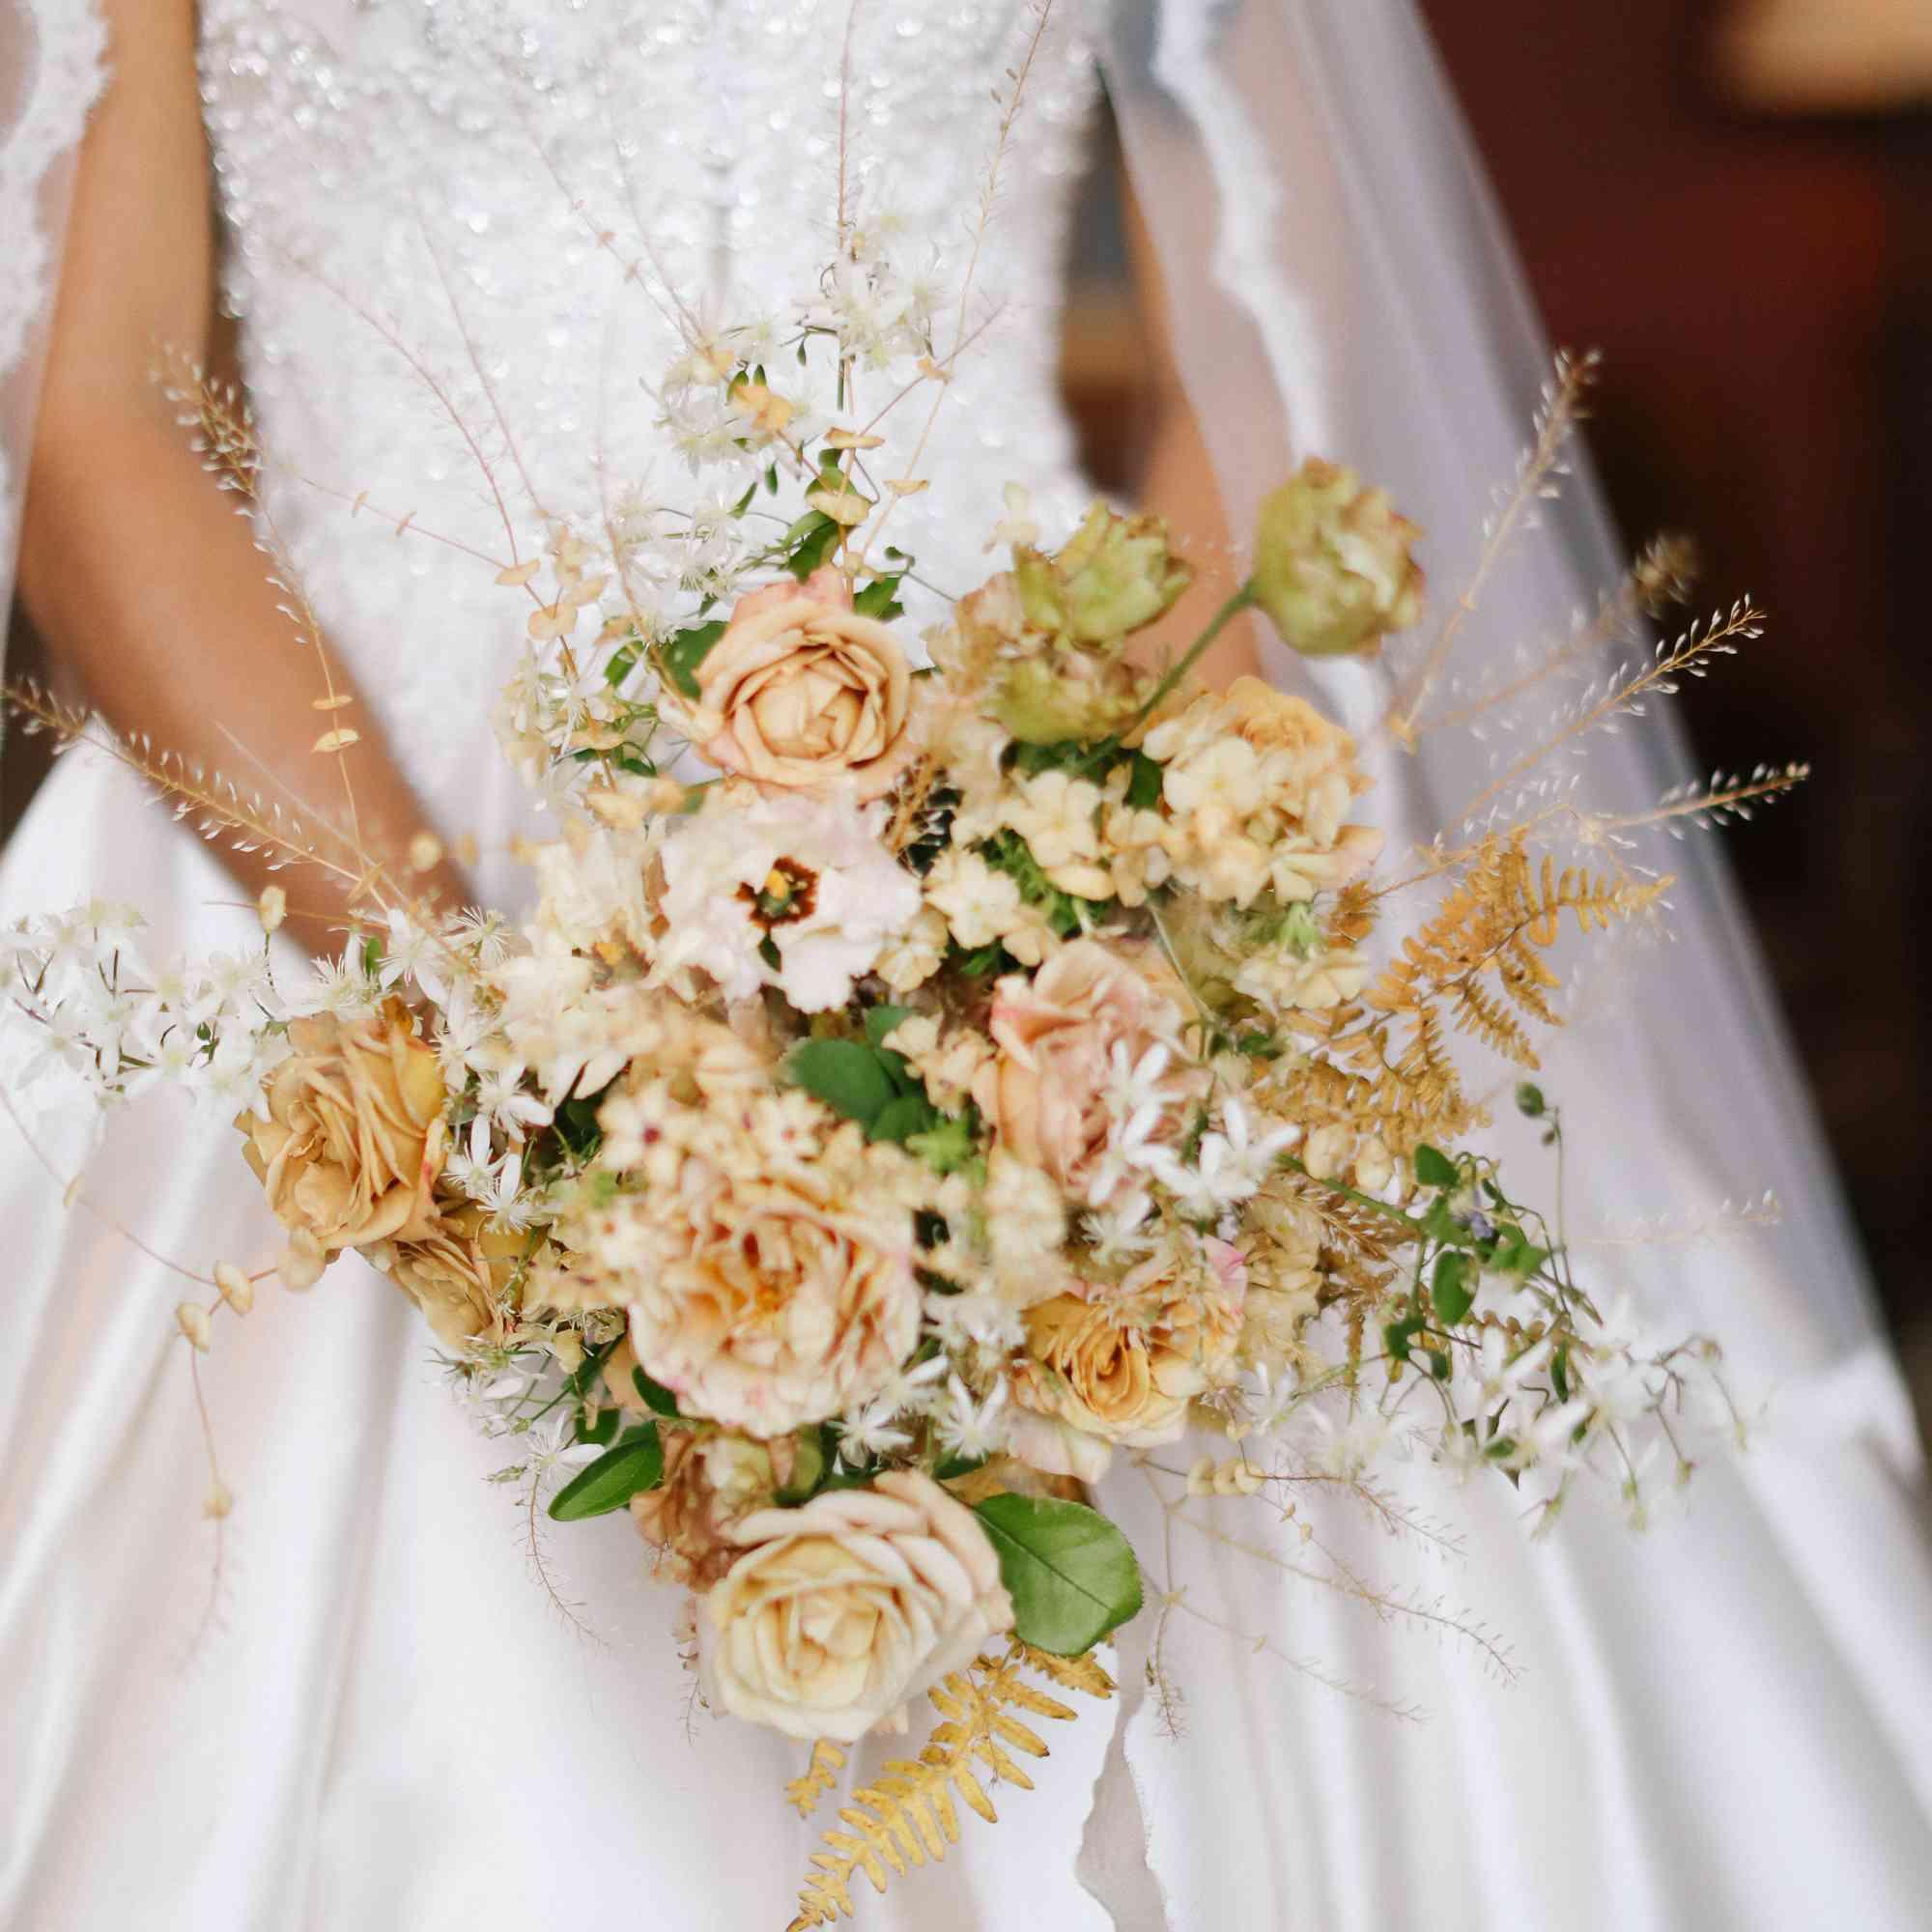 savannah and riker wedding, bouquet